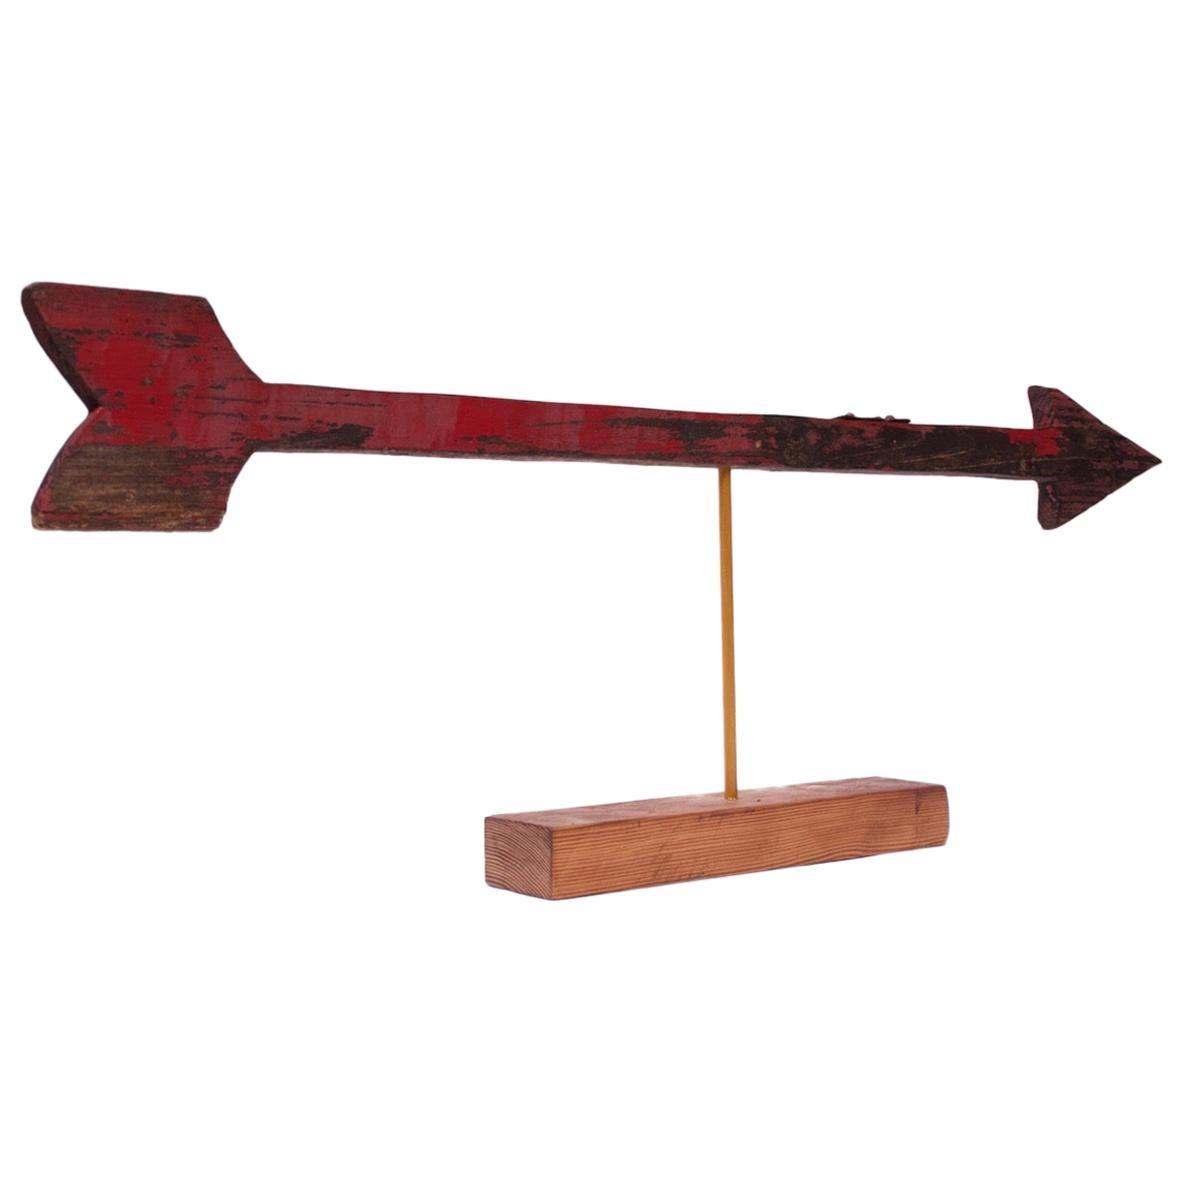 "Folk Art ""Arrow"" Mounted Sign"